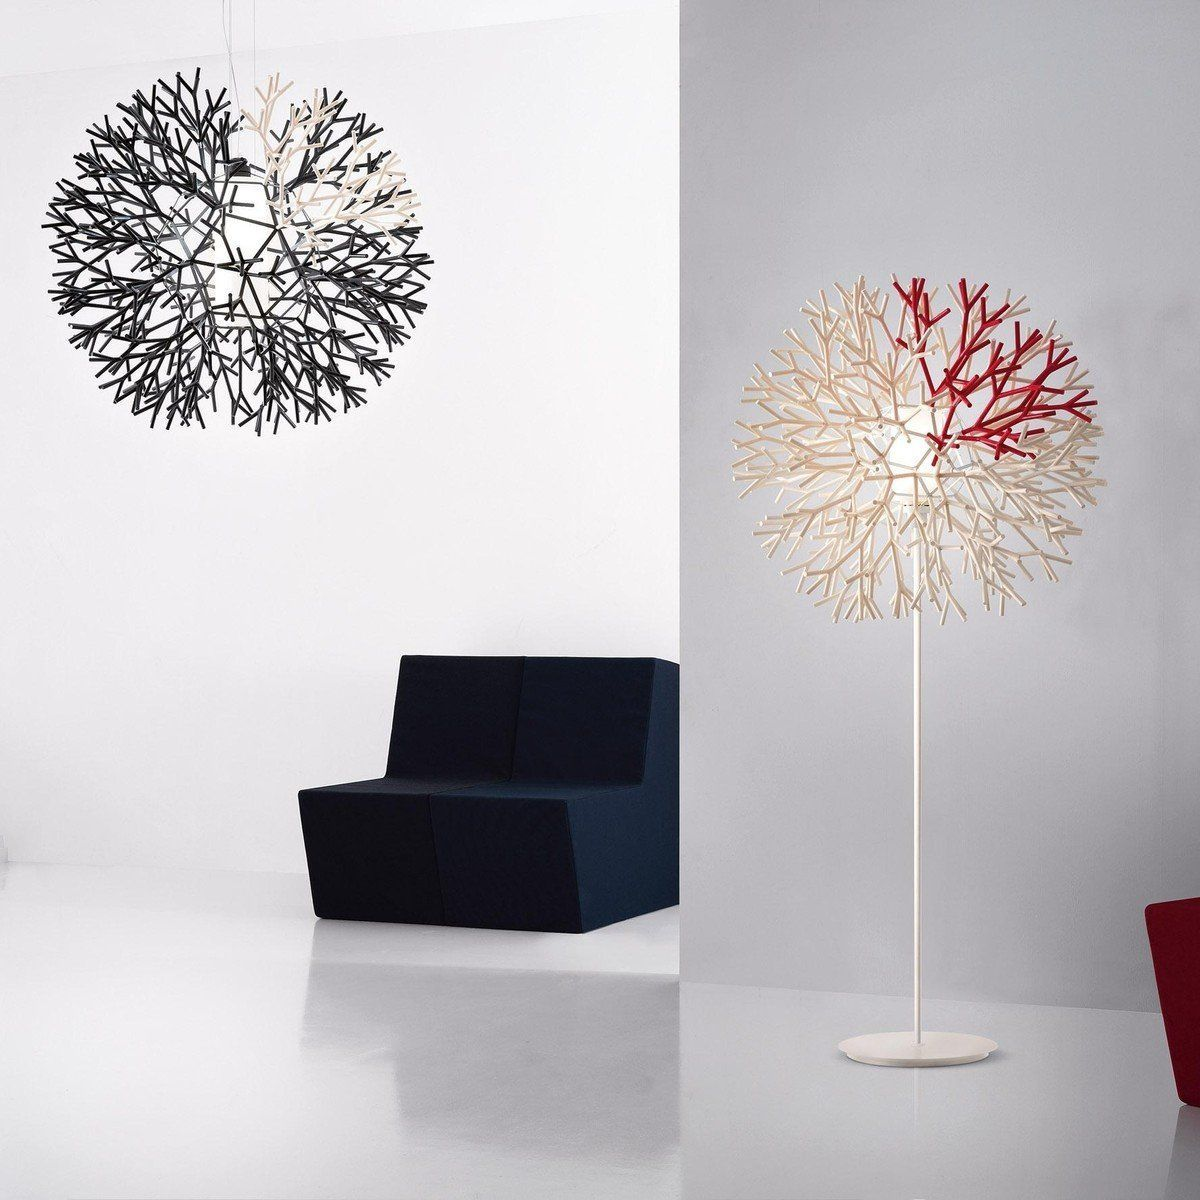 Marvelous Pallucco   Coral 60 Suspension Lamp Pallucco   Coral 60 Suspension Lamp ... Home Design Ideas